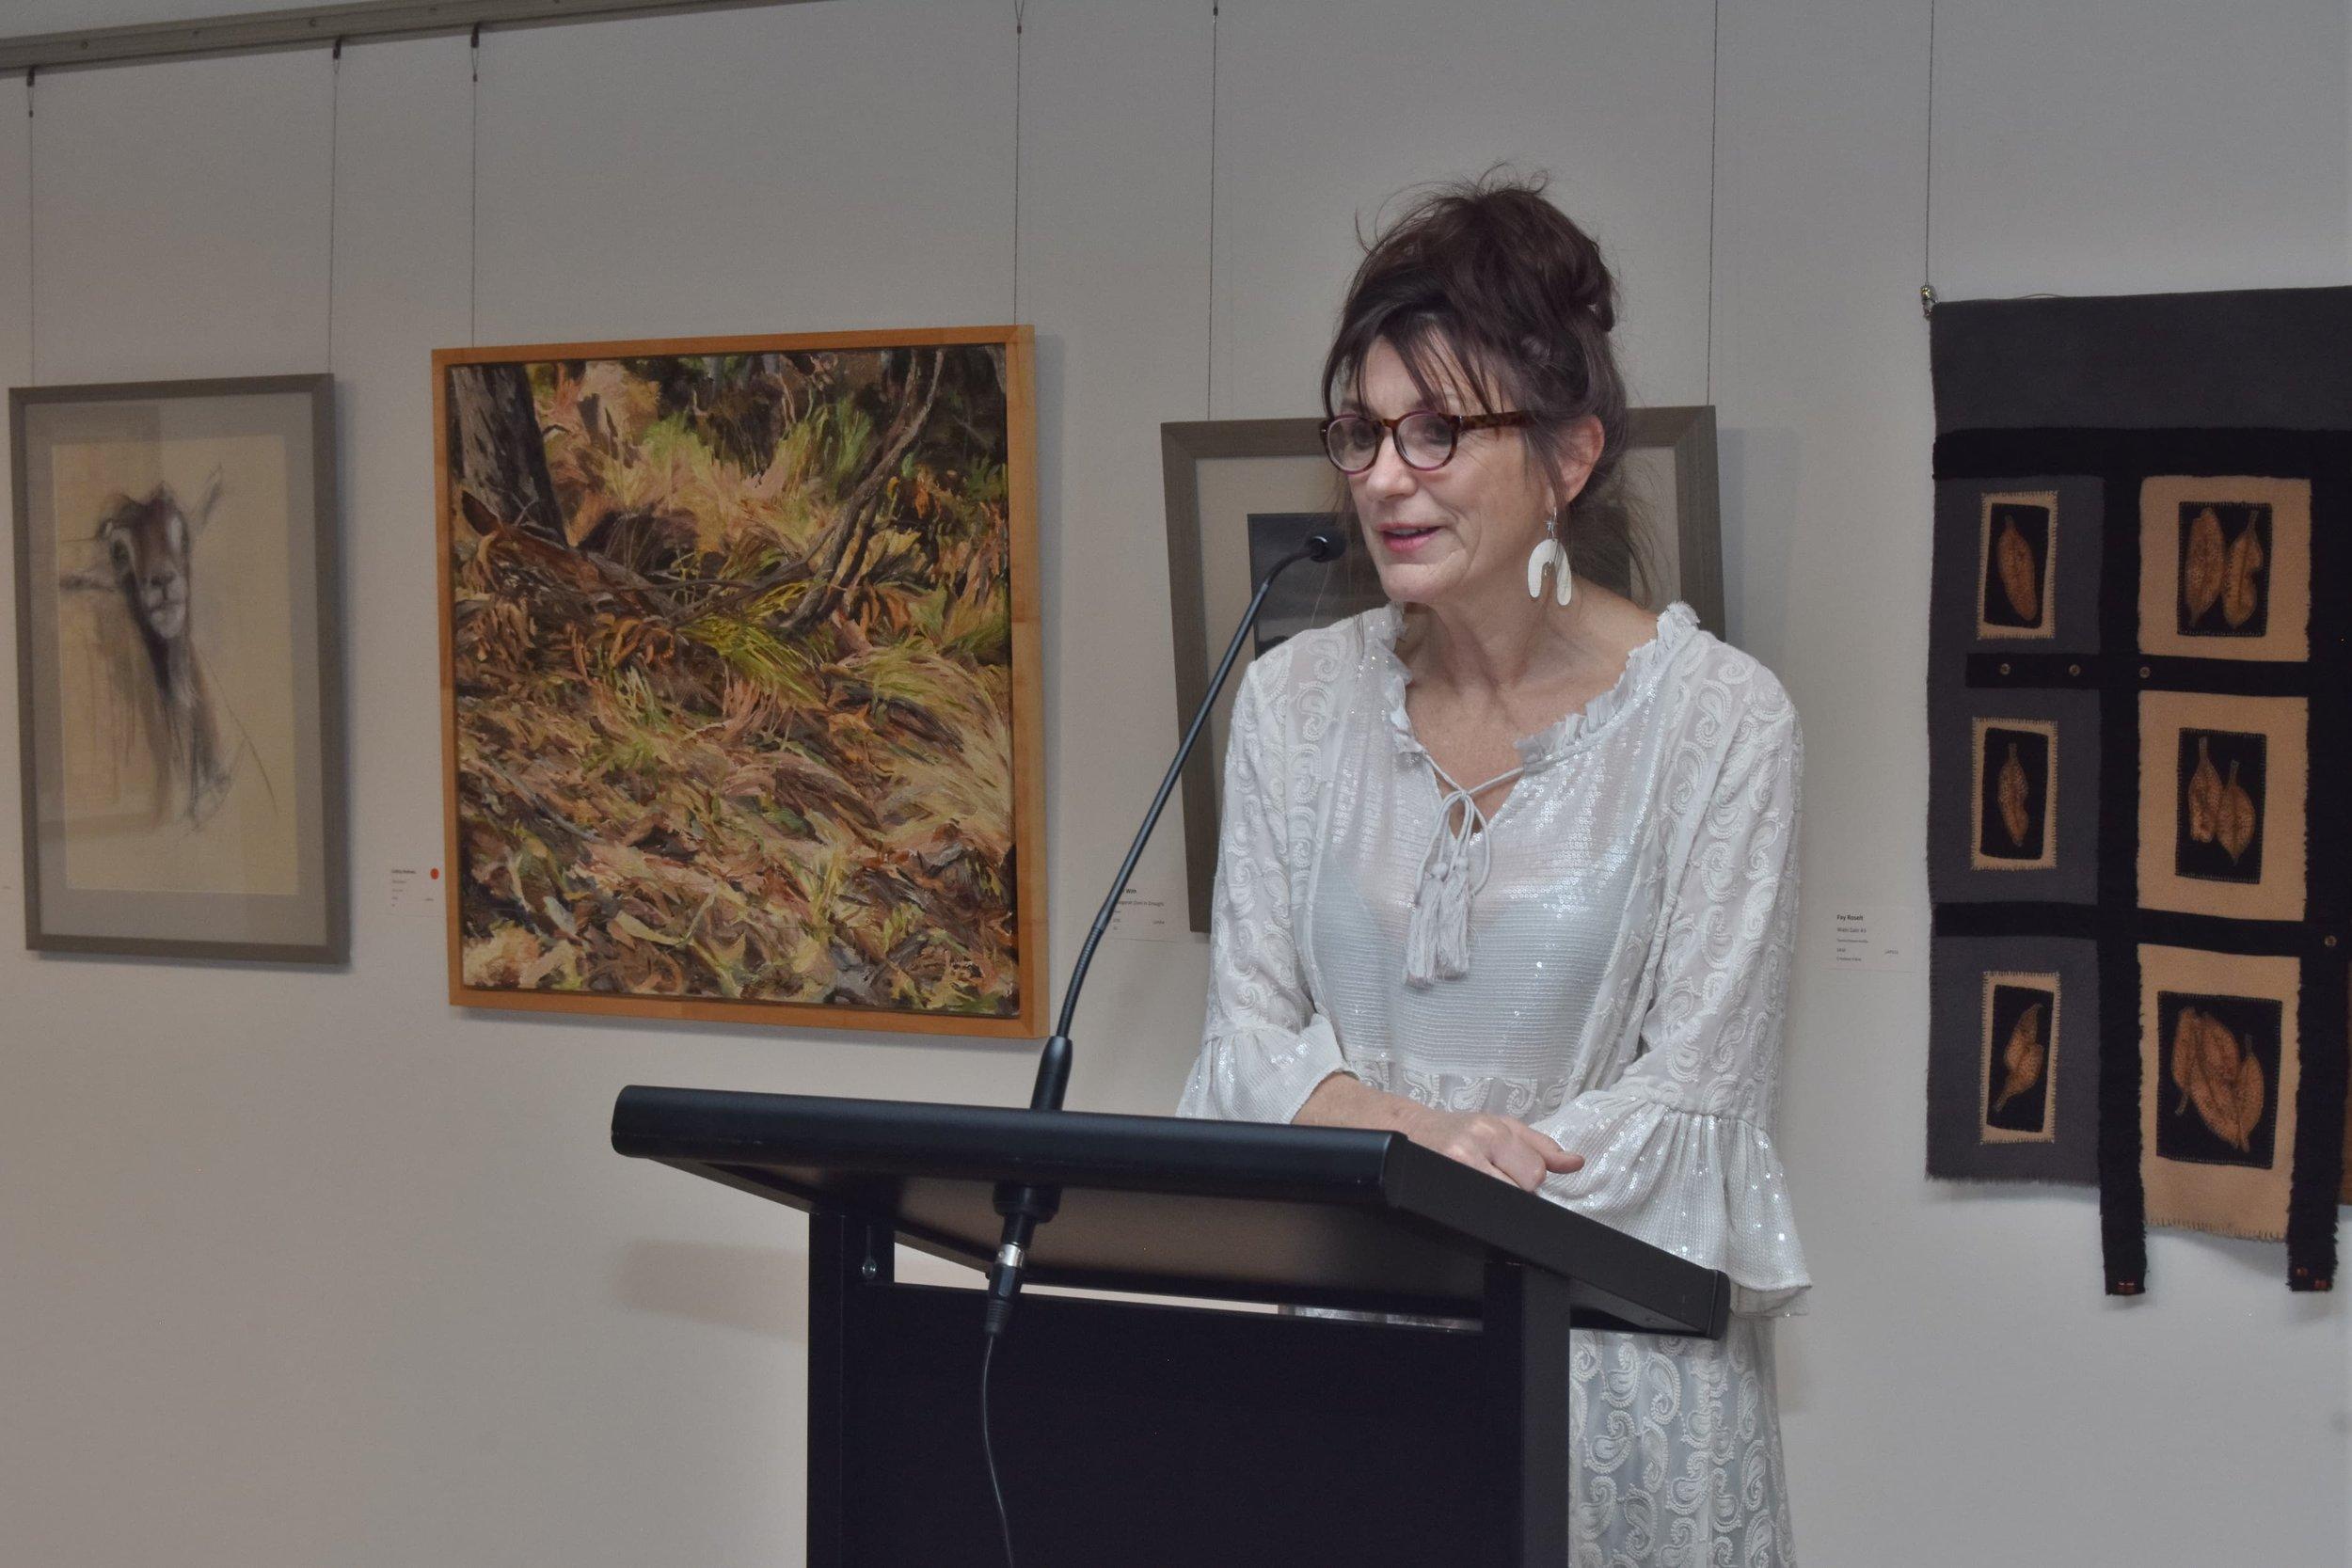 Gallery Director, Mary Findlay